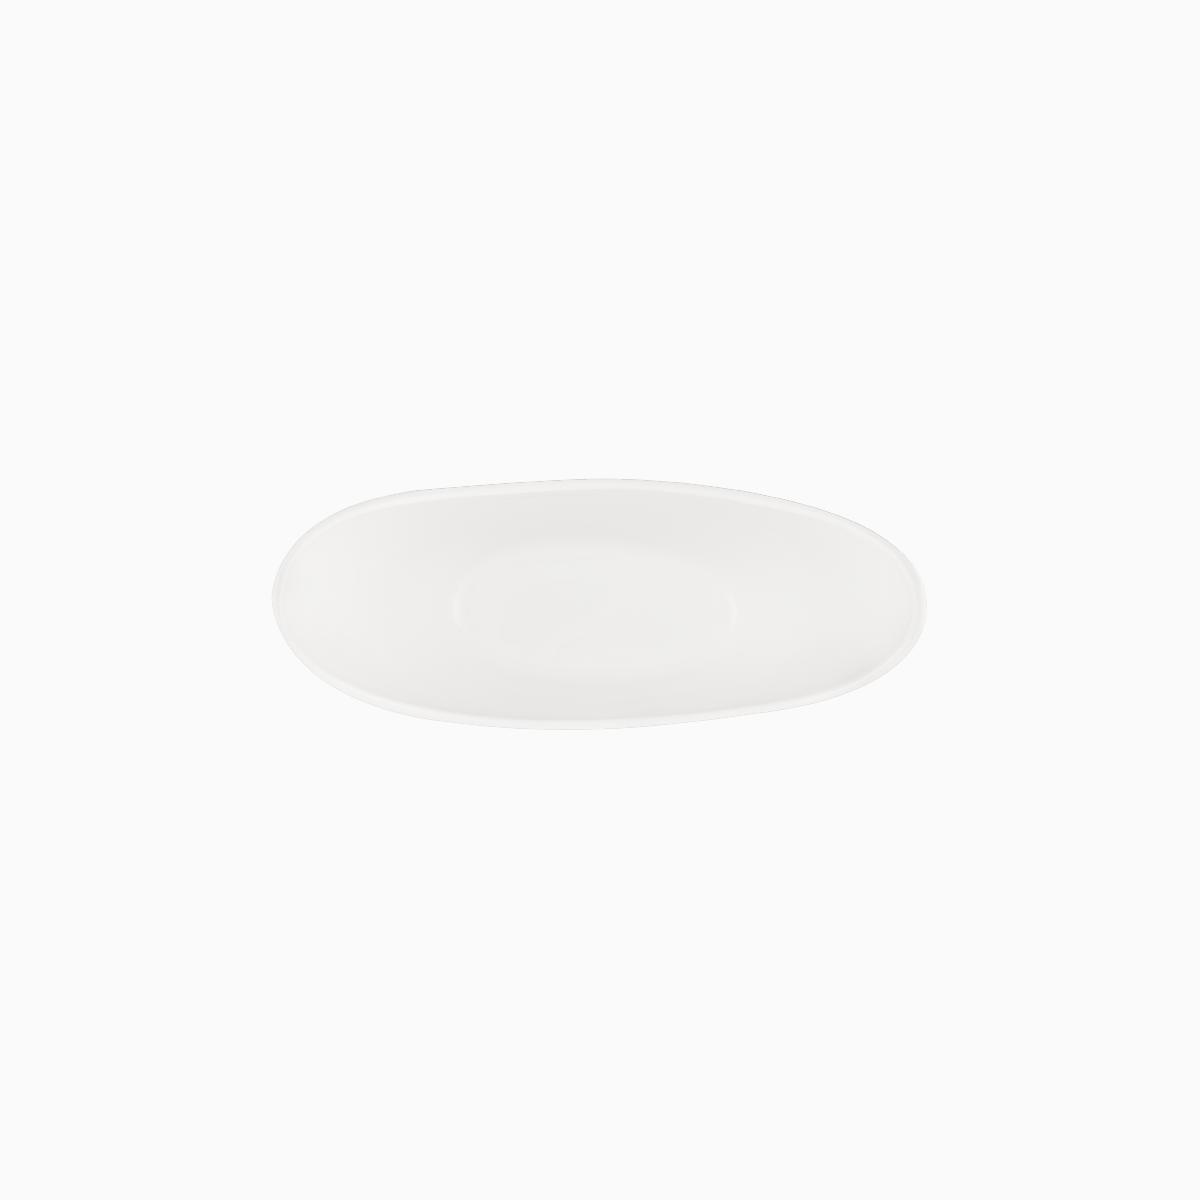 Schale oval